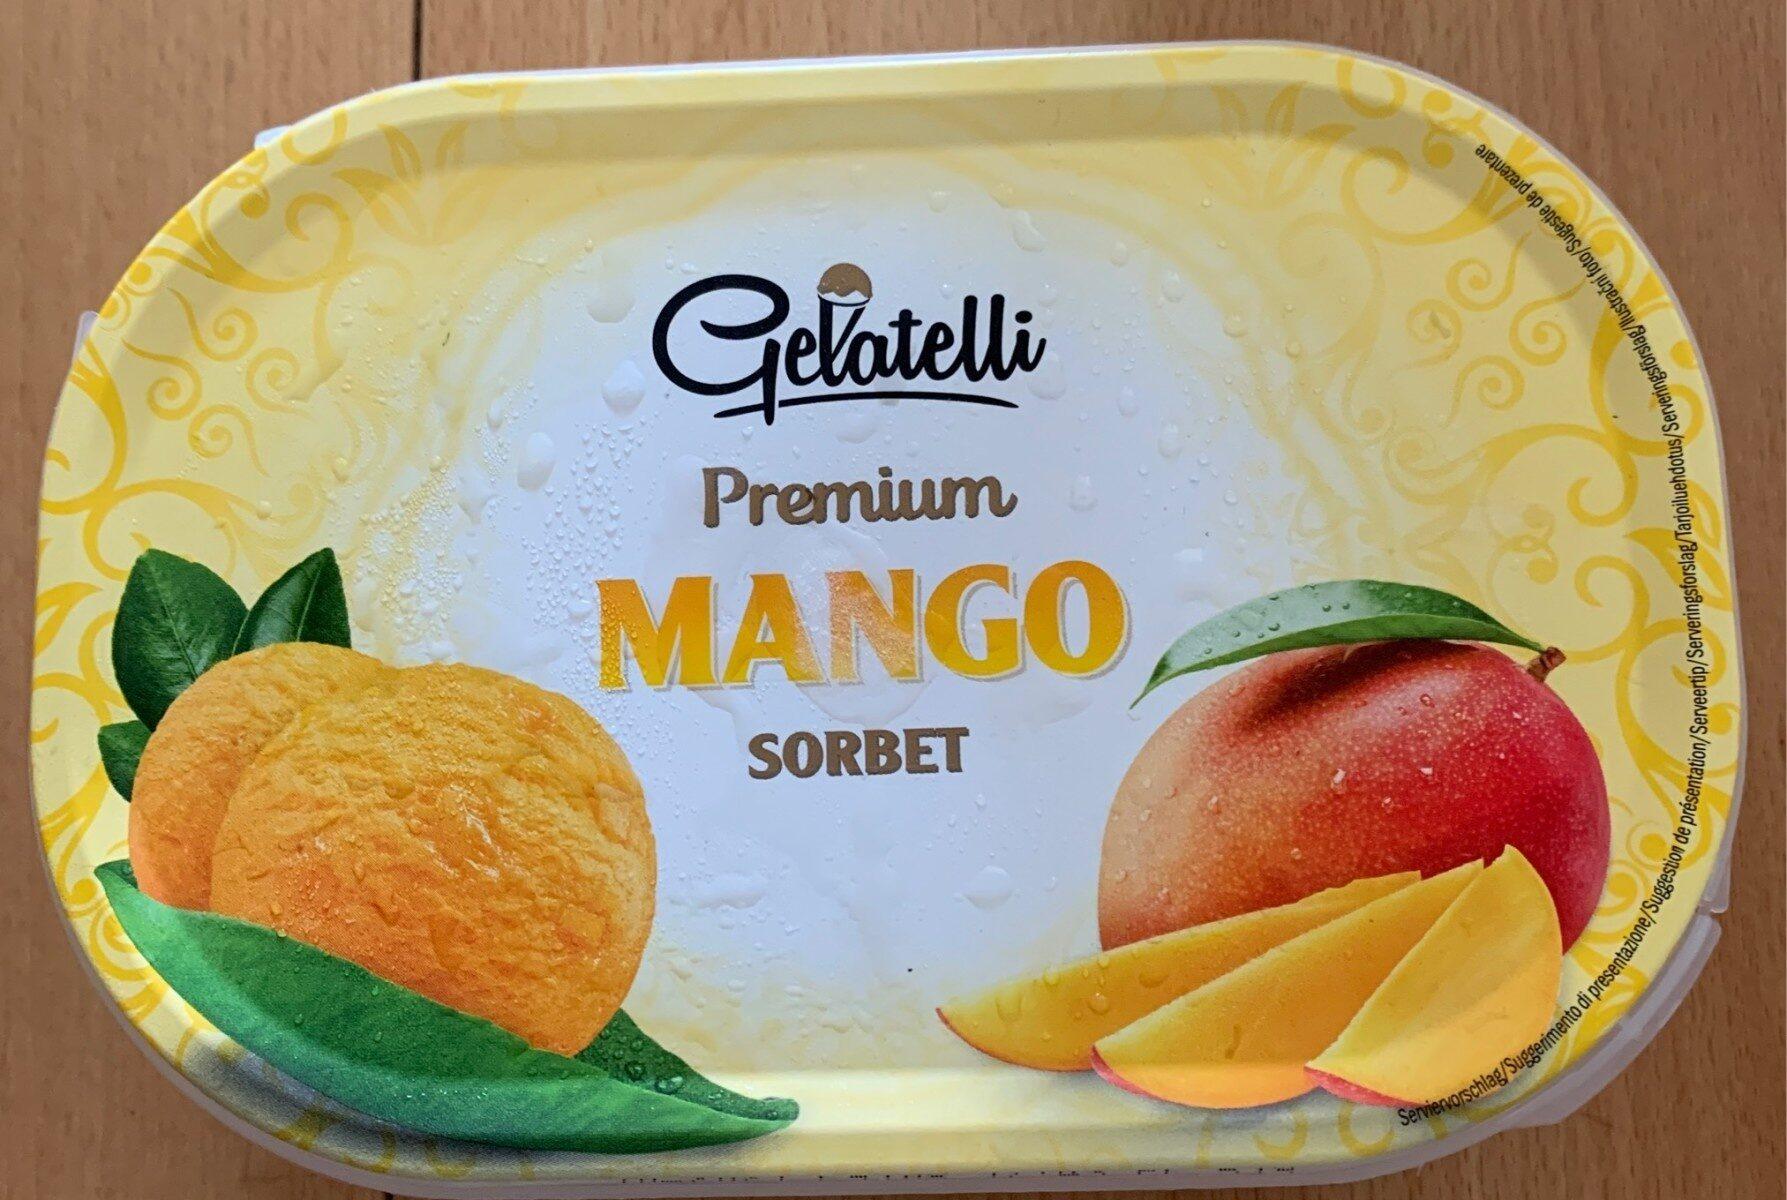 Premium Mango Sorbet - Producto